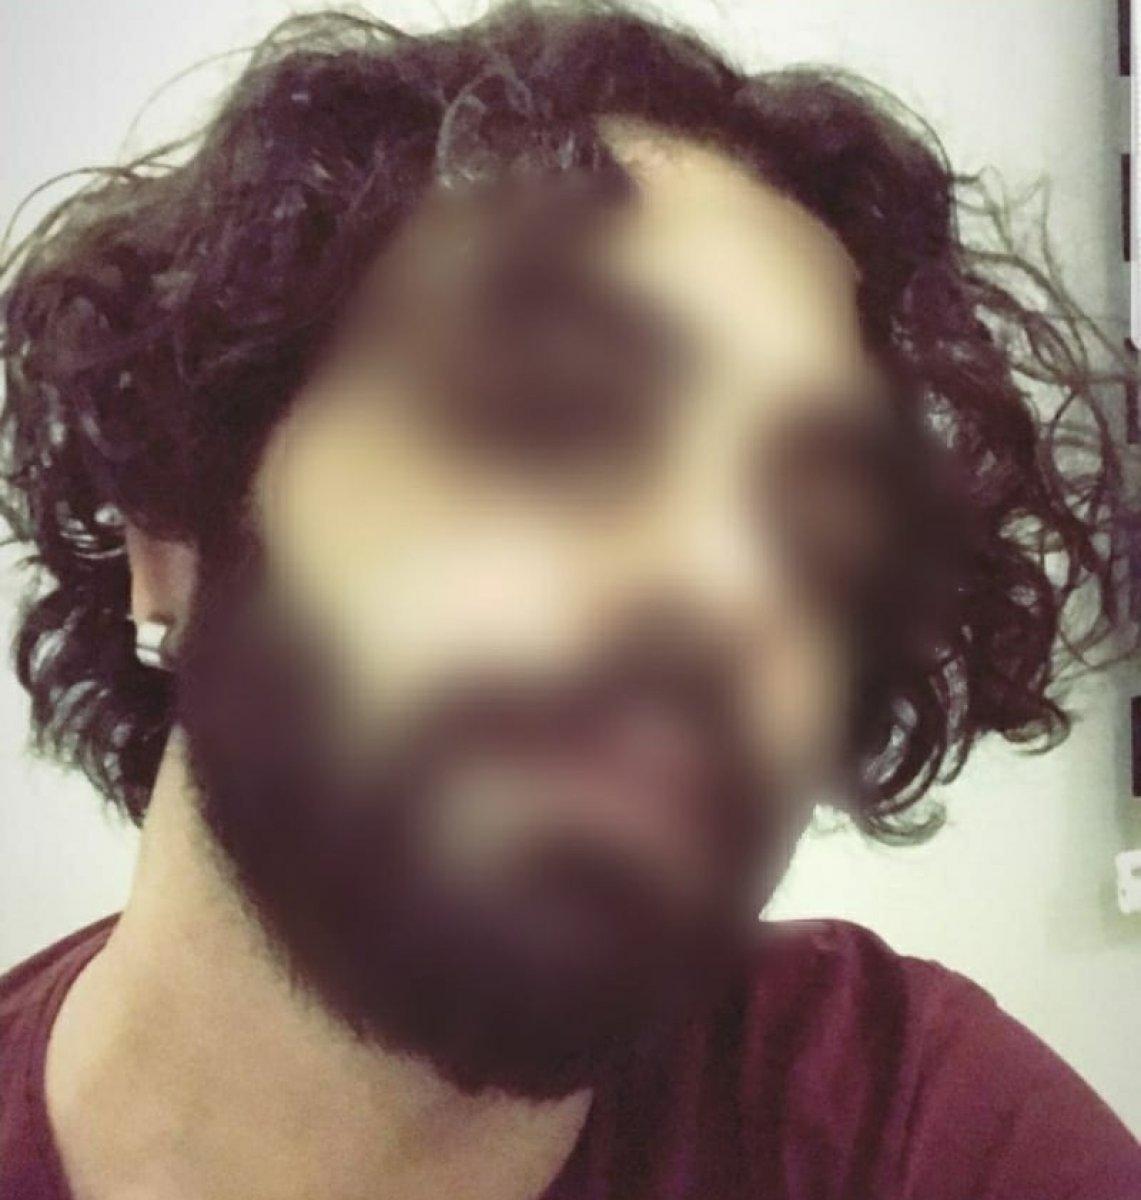 Adana da cinsel şiddet iddiasına tutuklama  #3